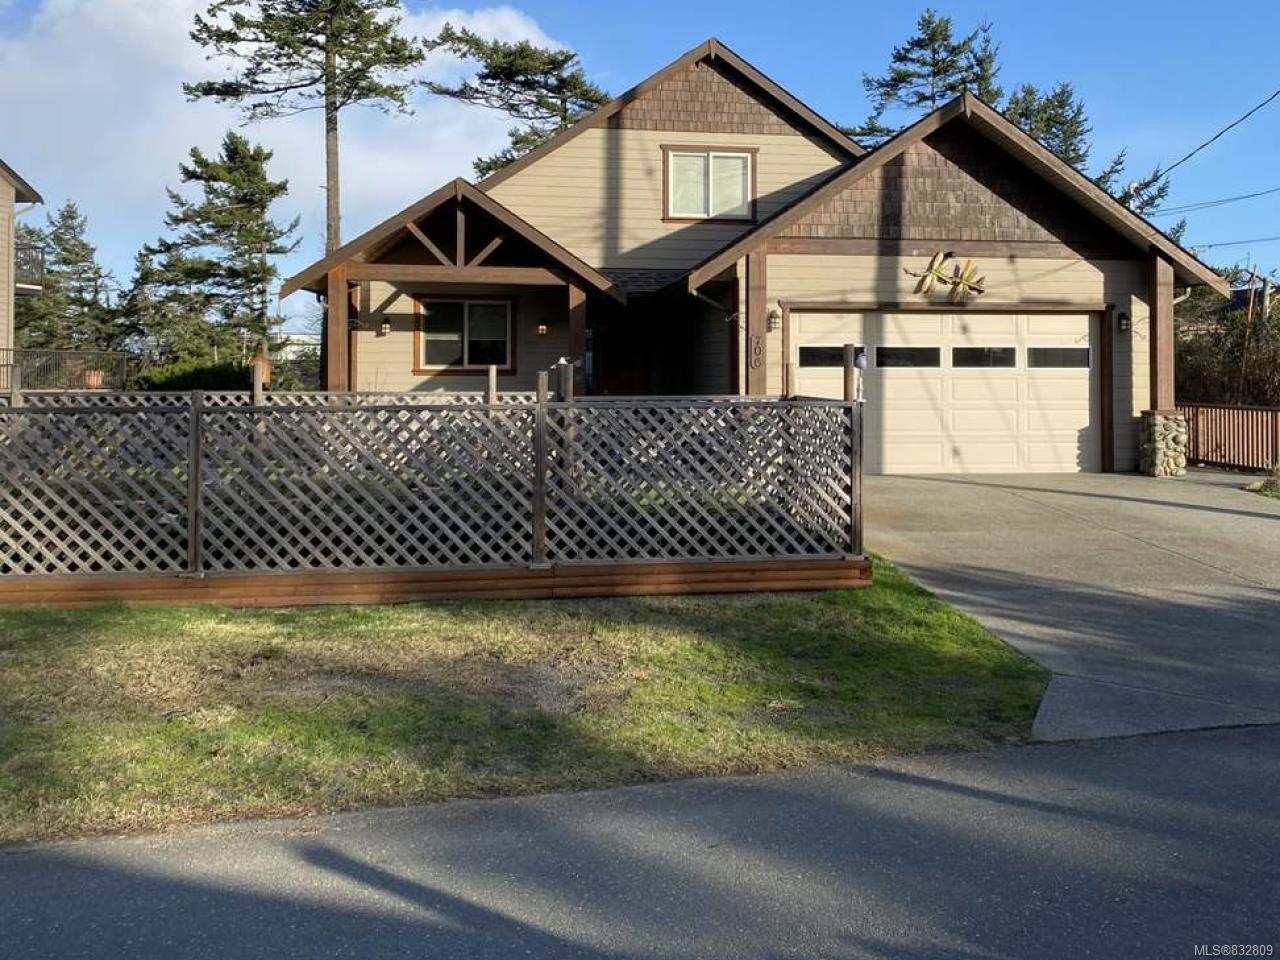 Main Photo: 706 Alvord Cres in COMOX: CV Comox Peninsula House for sale (Comox Valley)  : MLS®# 832809